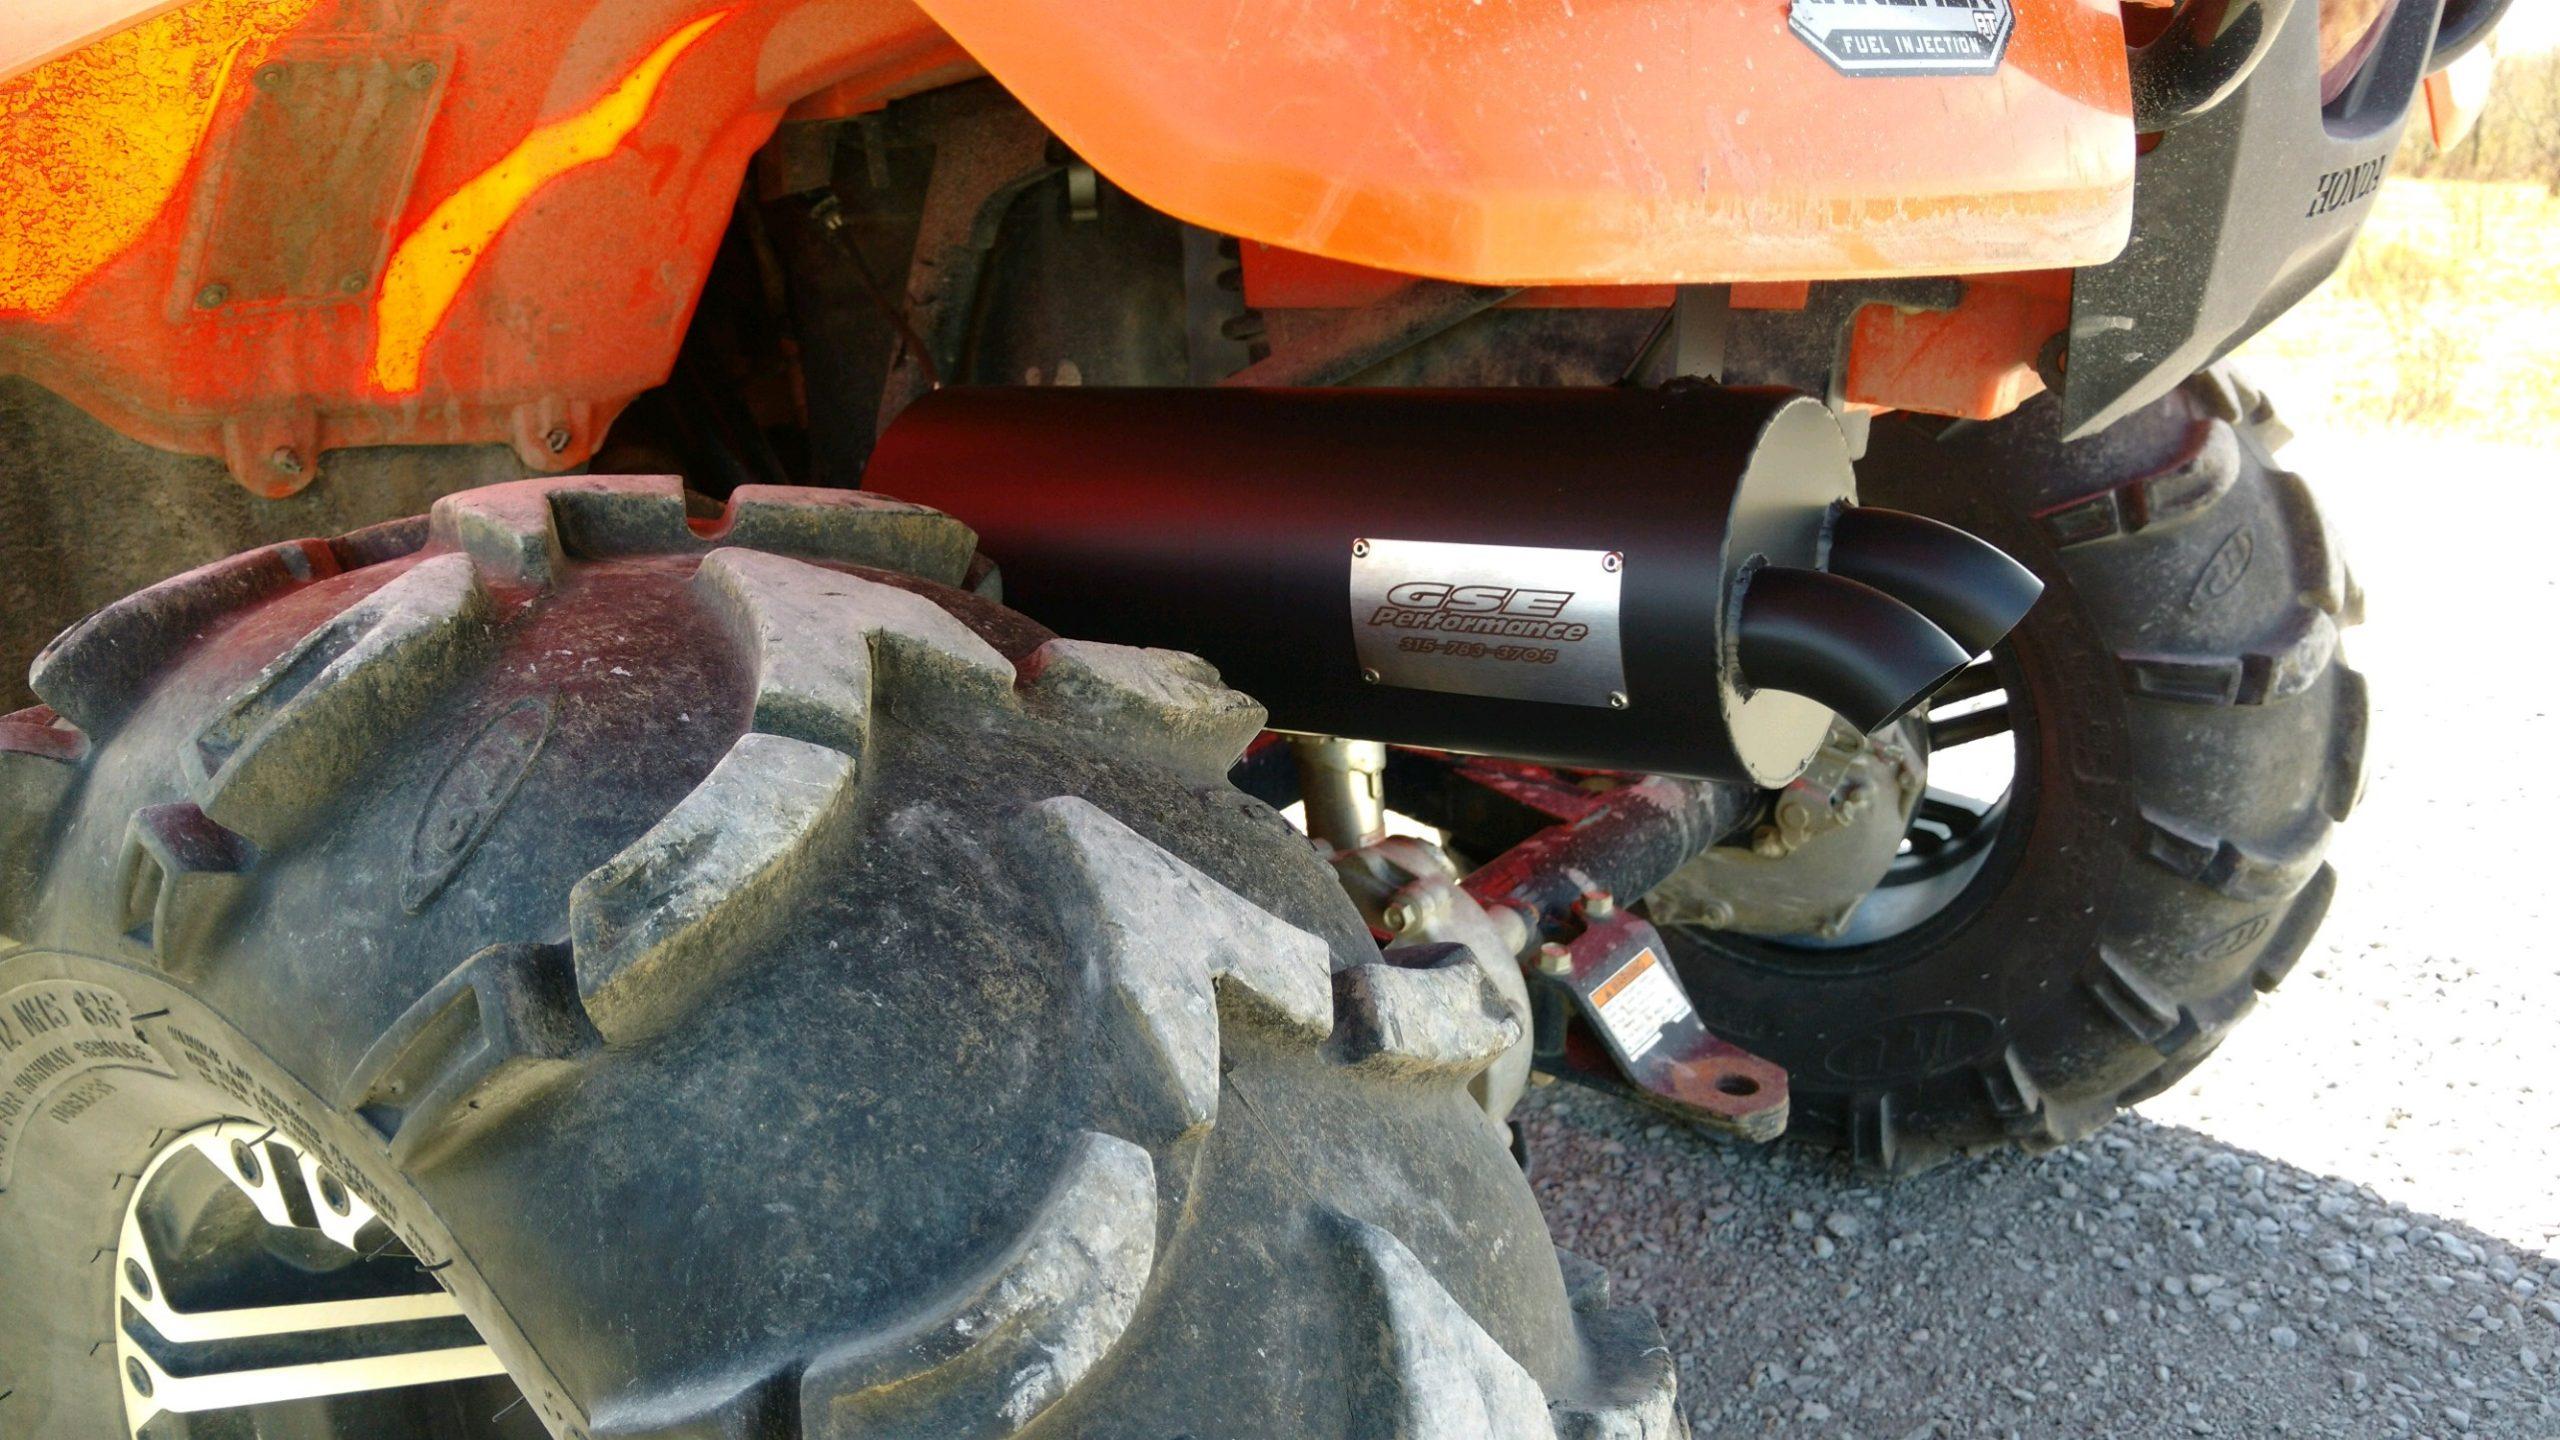 18300 honda rancher 420 foreman 500 2014 2020 full exhaust